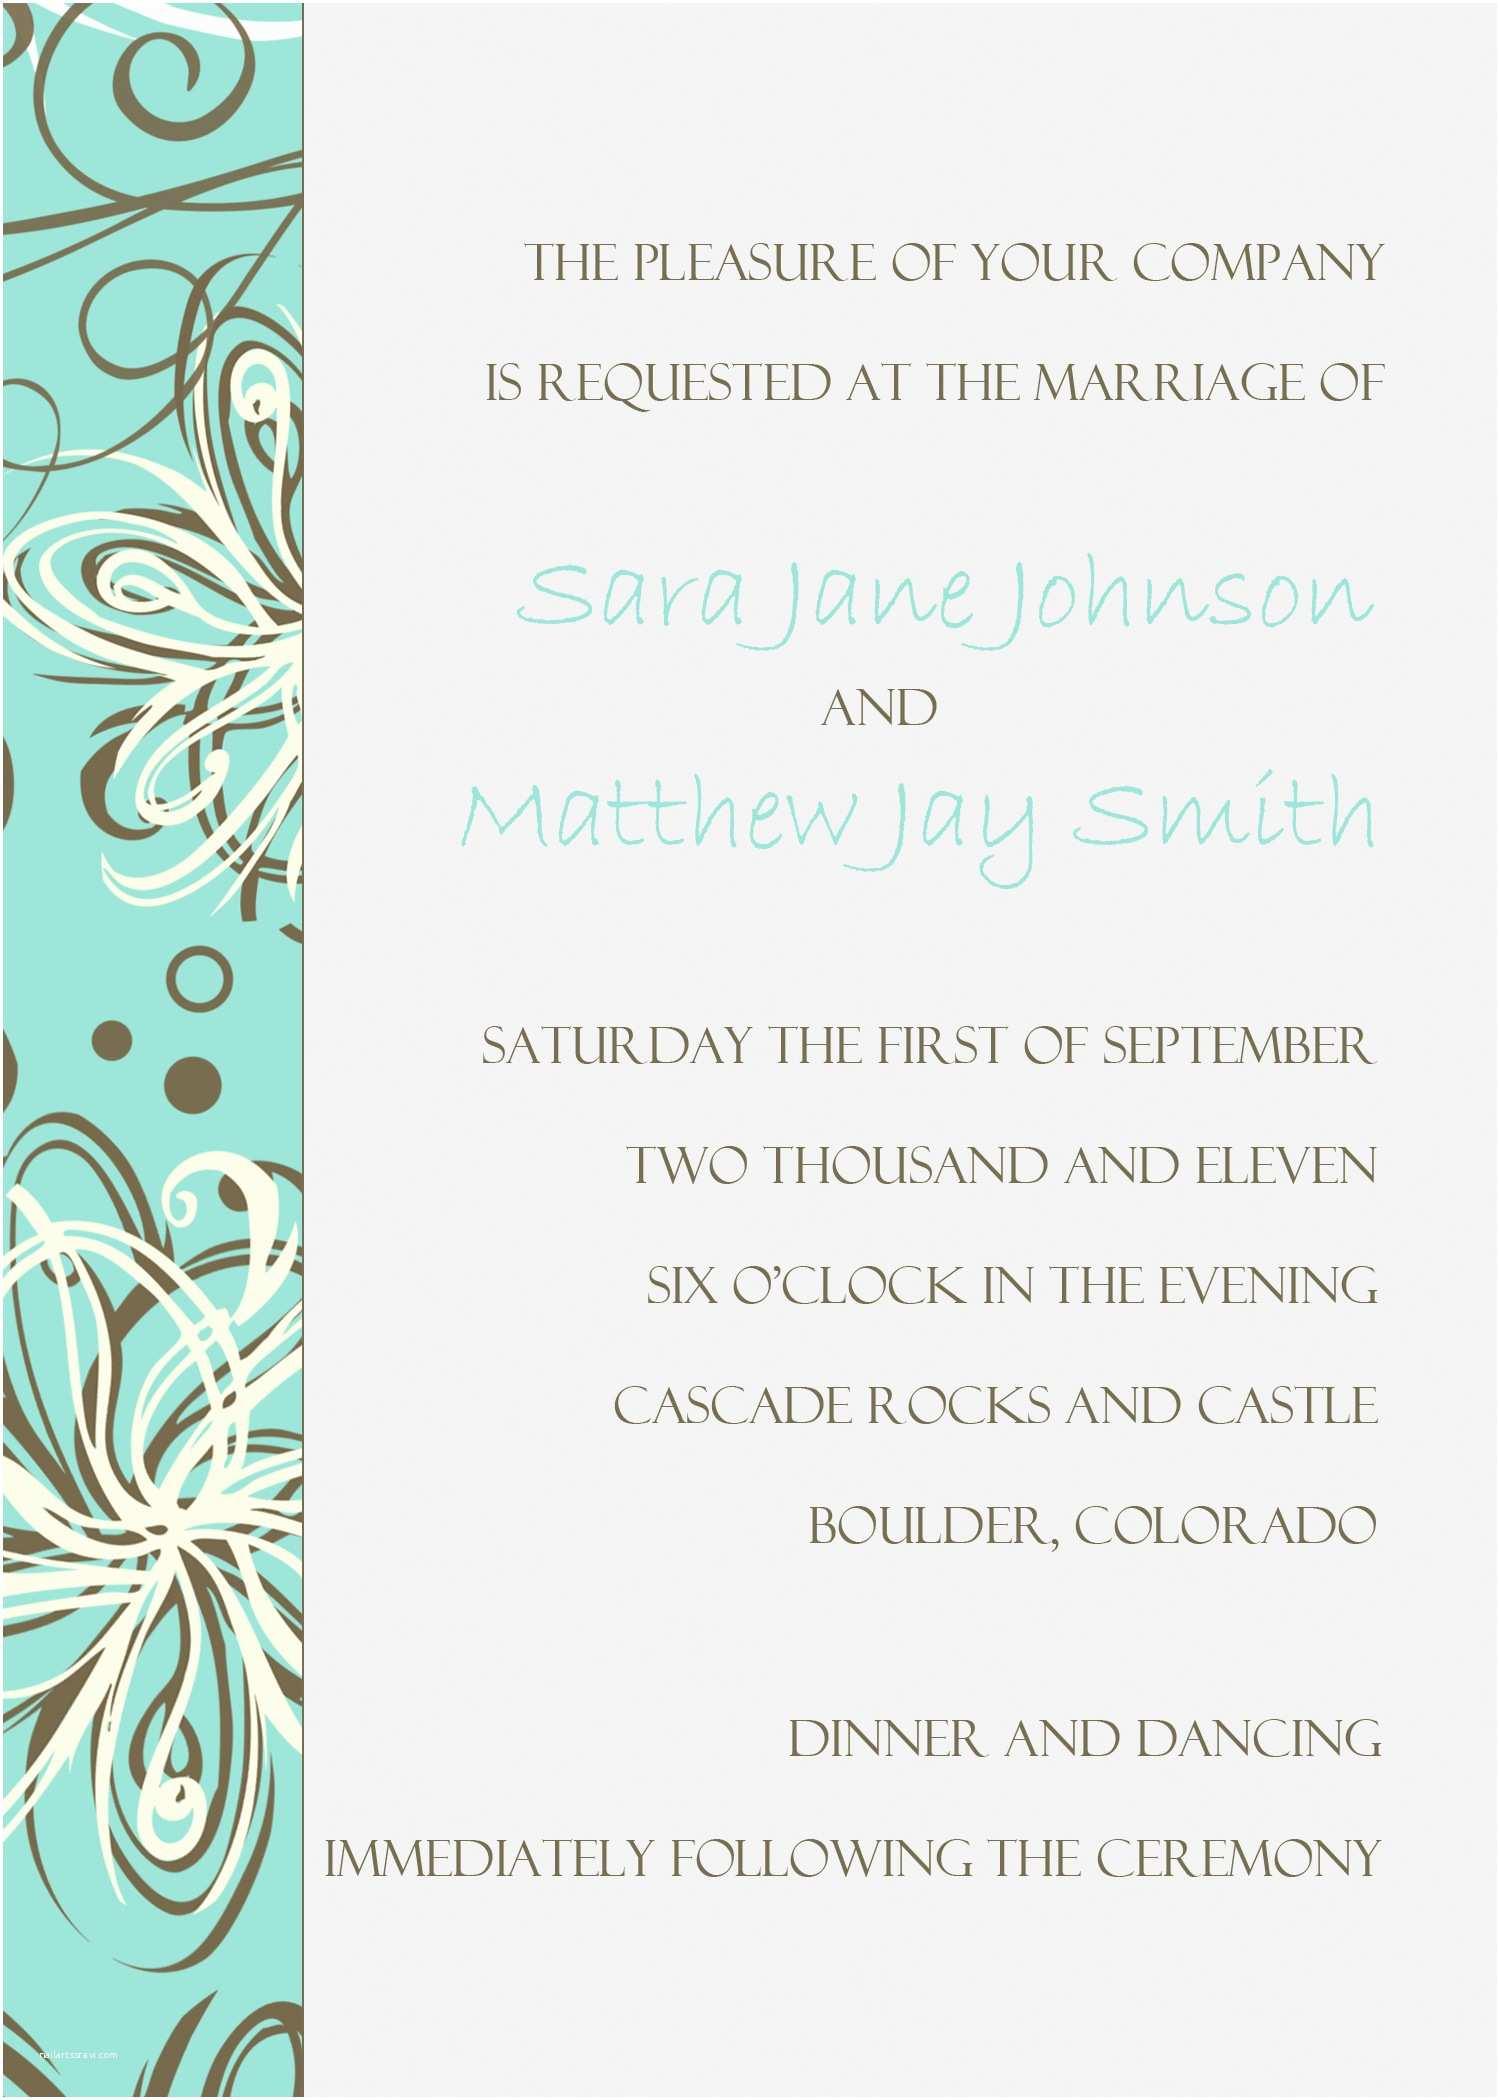 Free Printable Wedding Invitation Templates for Microsoft Word Free Wedding Invitation Templates